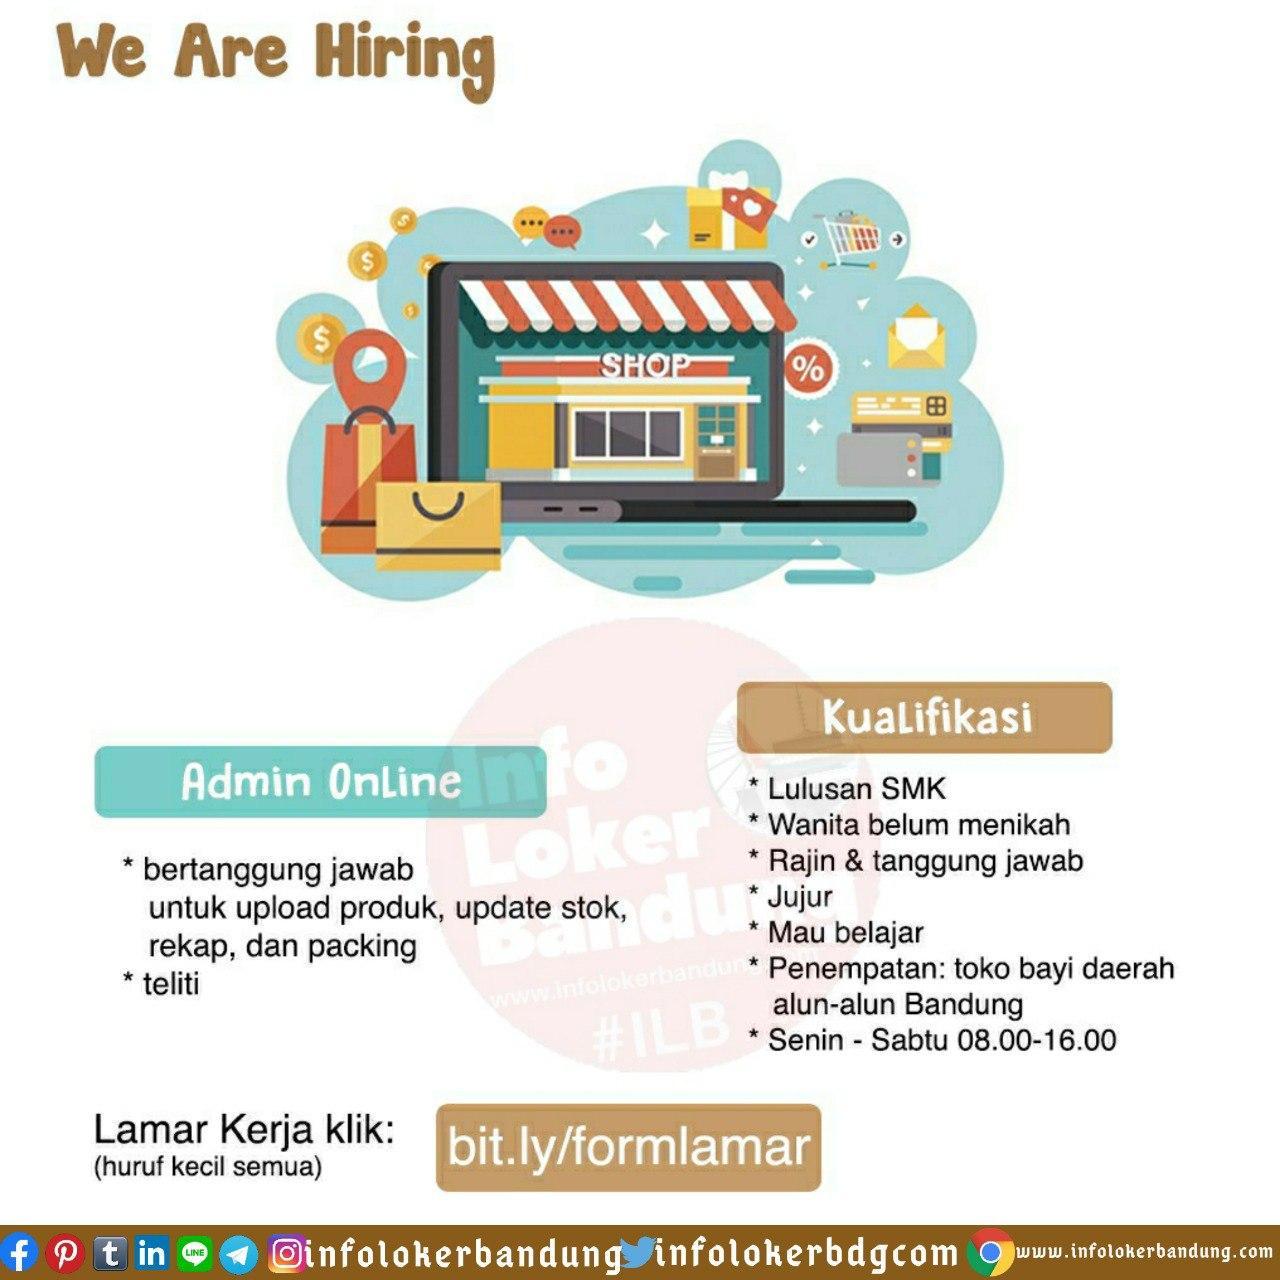 Lowongan Kerja Admin Online Toko Bayi Bandung Juni 2020